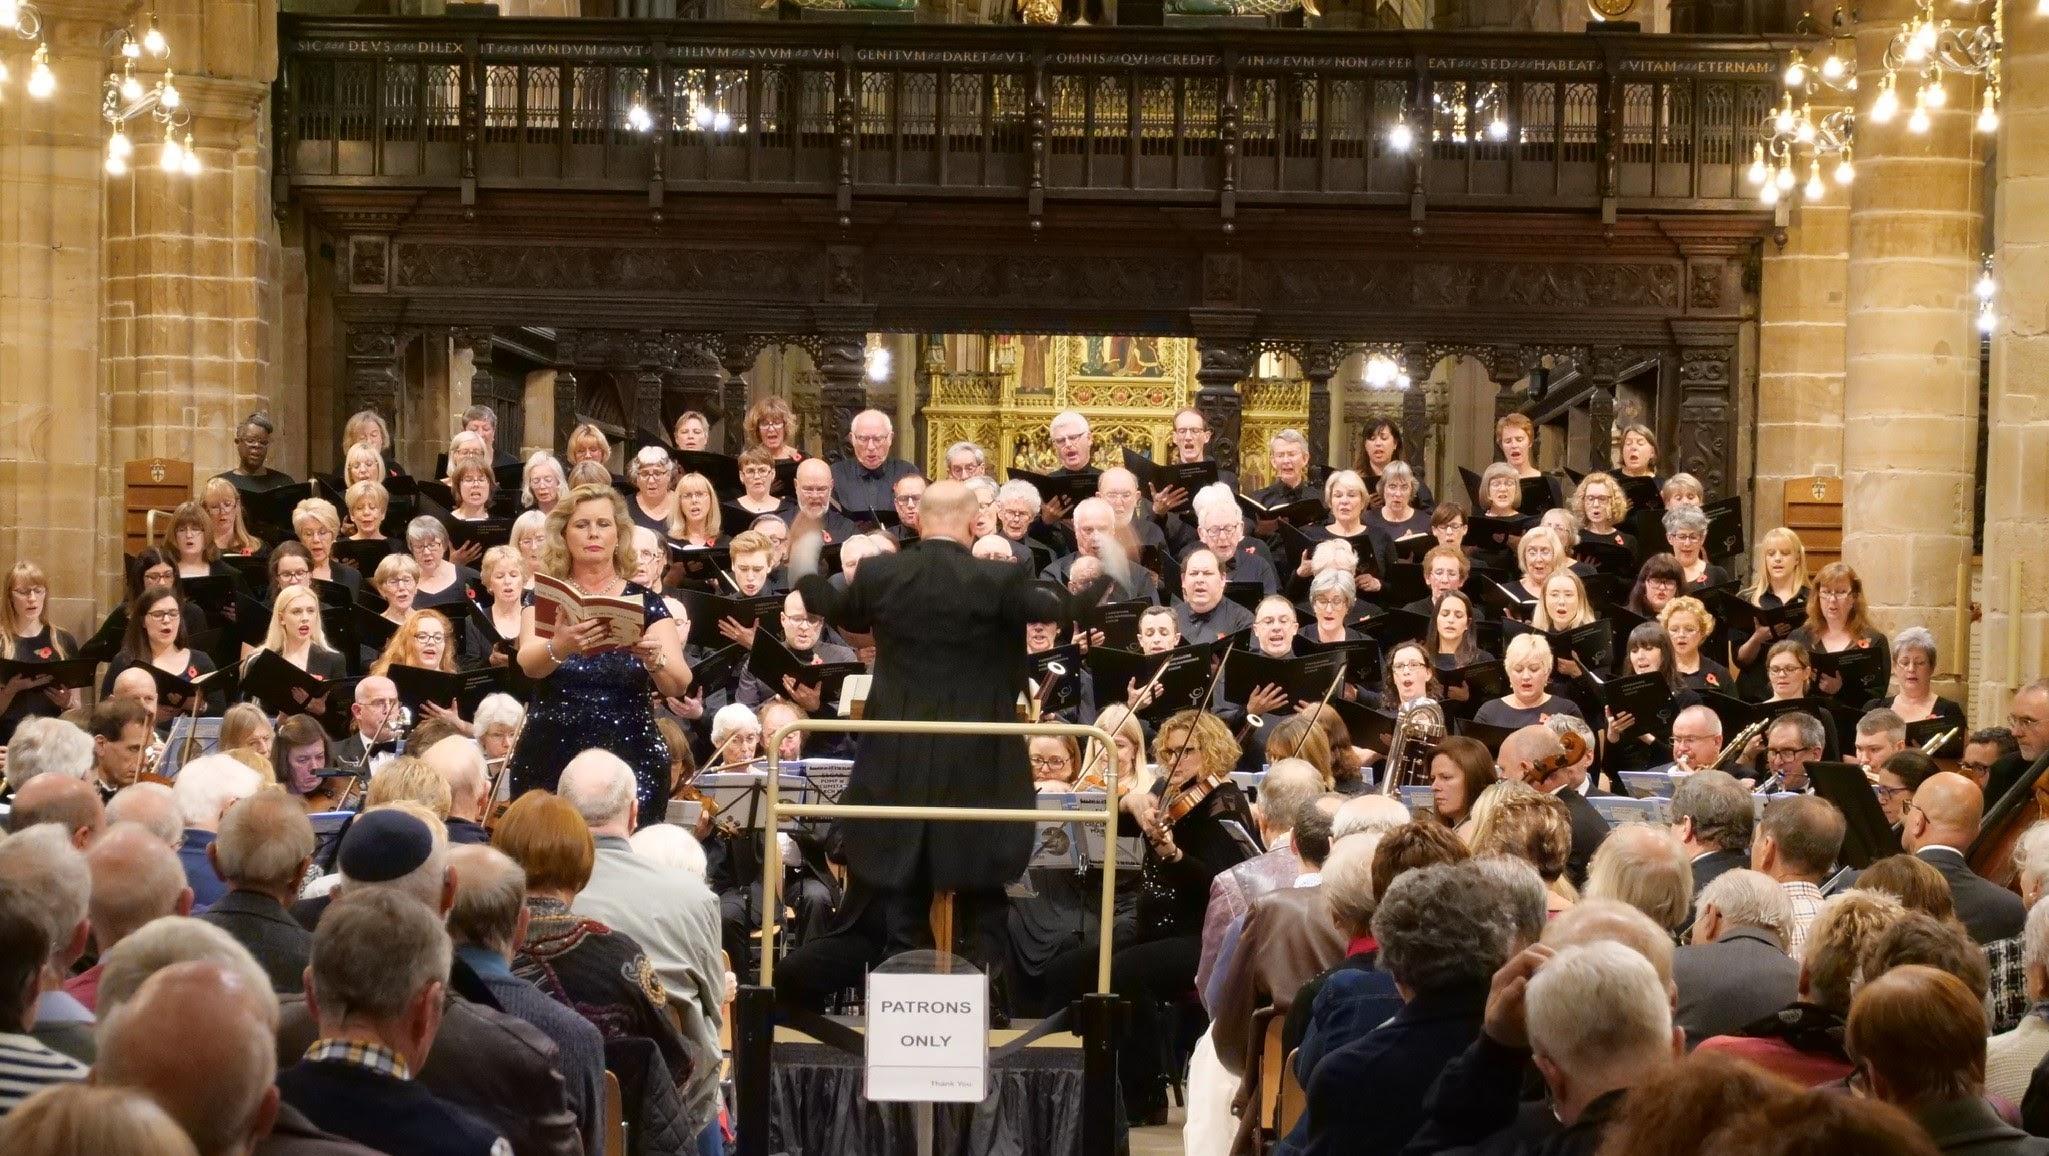 The Yorkshire Philharmonic Choir